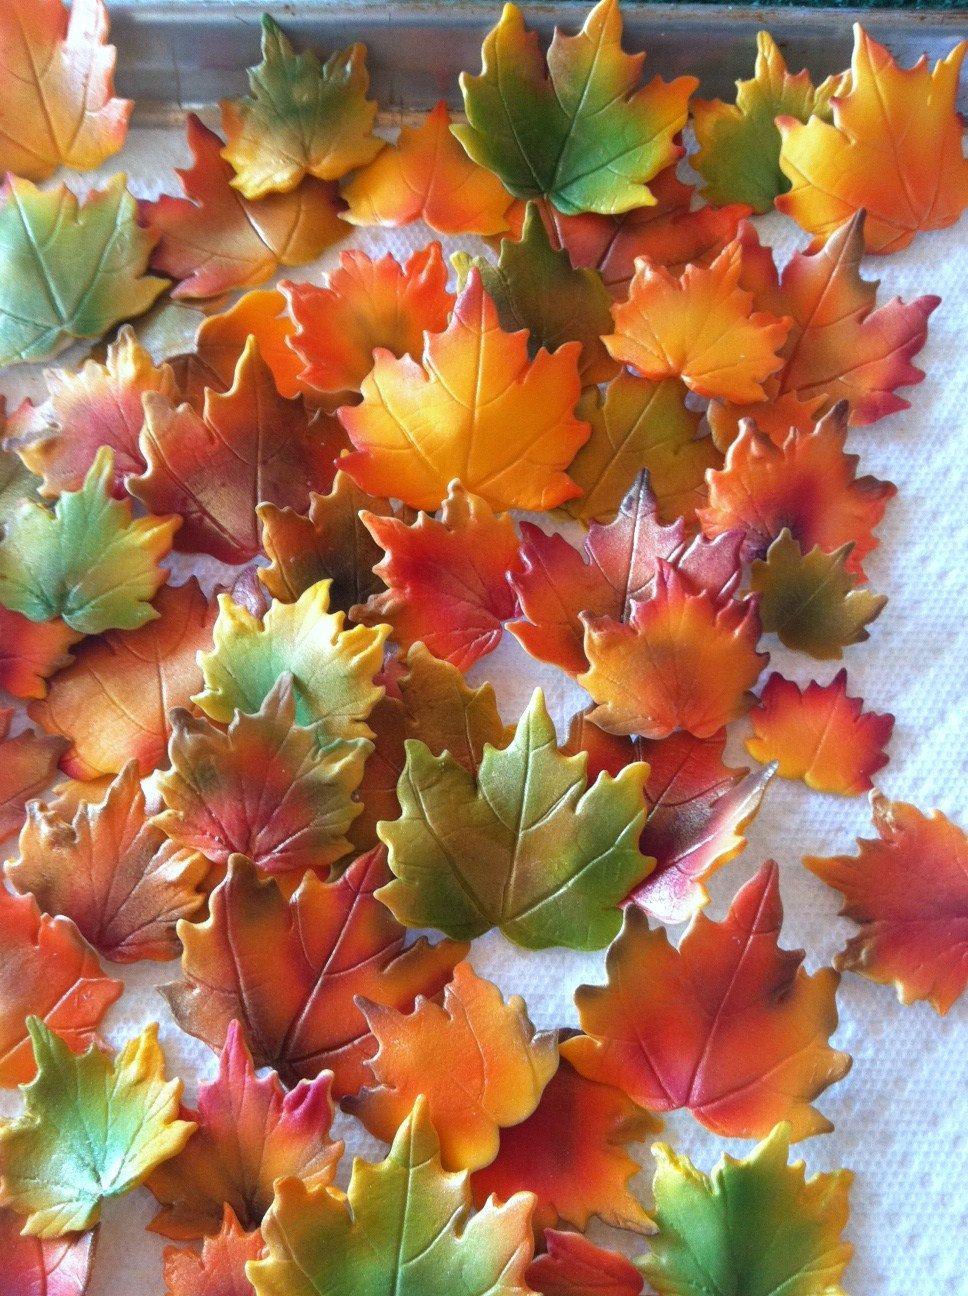 Sugar Paste Cake Decorating Fall Maple Leaves Cake Decorations Edible Beautiful Fall Cakes